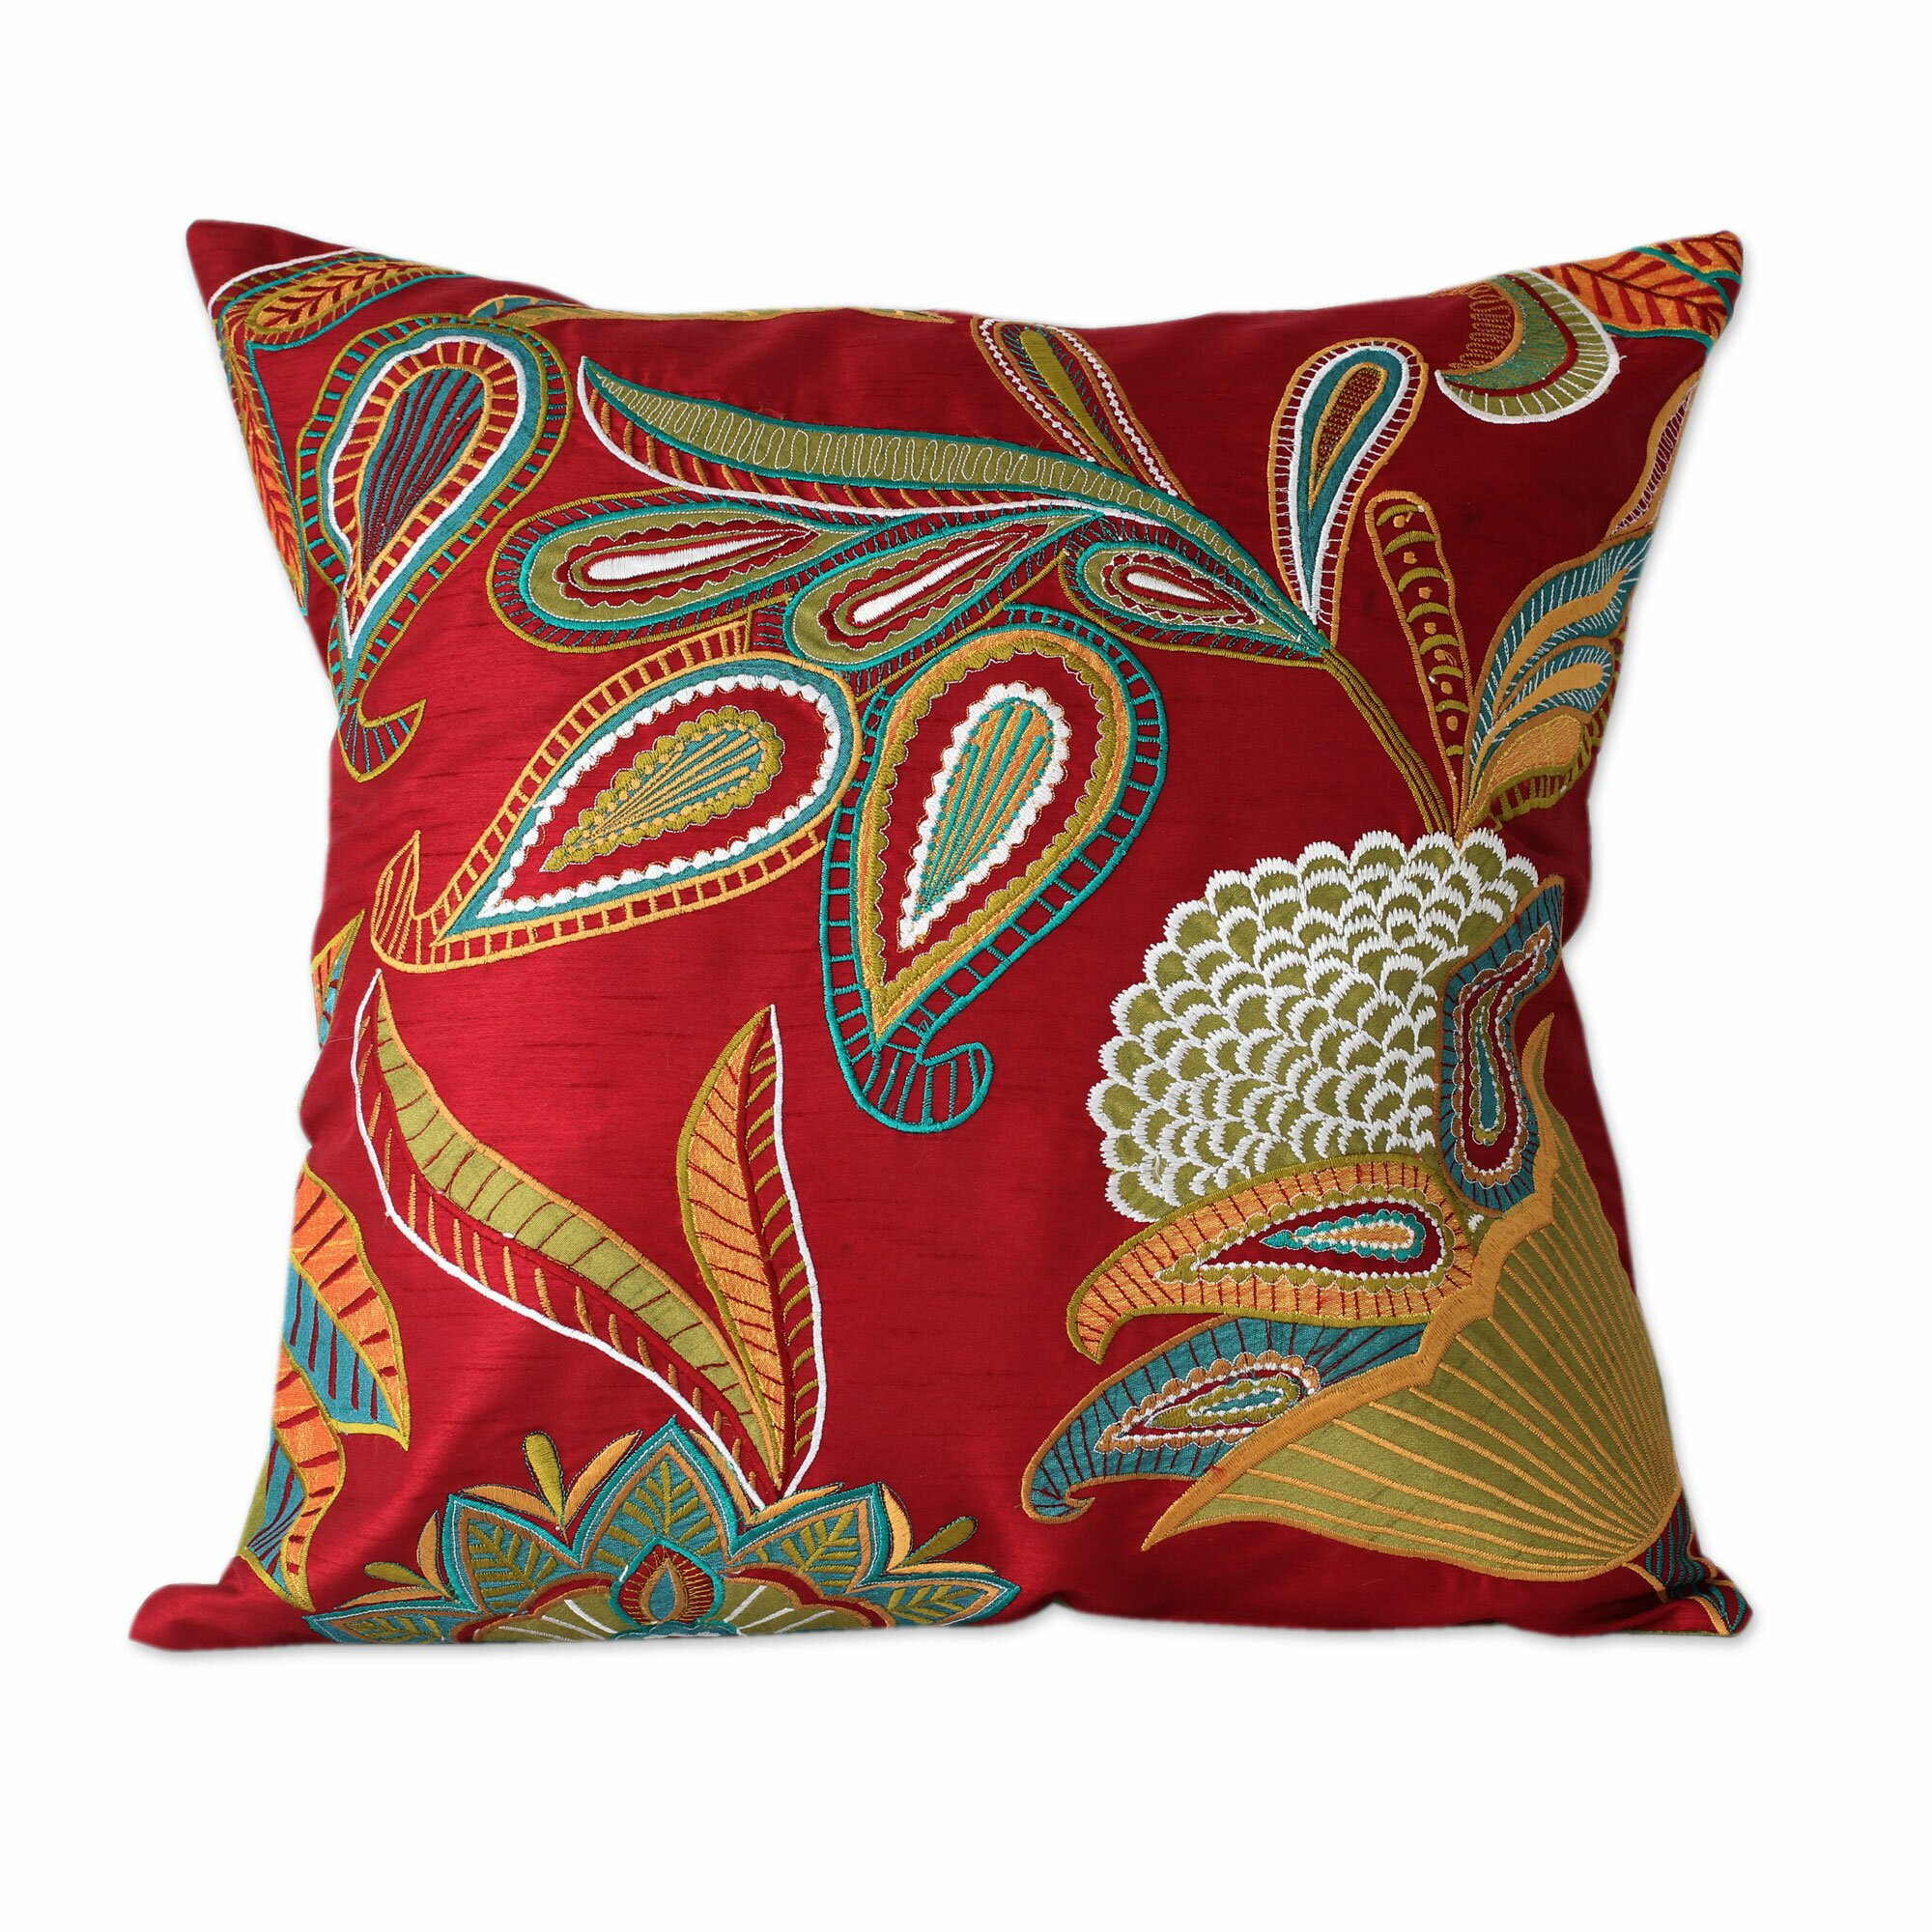 Throw Pillows Horchow : Novica Seema Handmade Embroidered Applique Throw Pillow Cover & Reviews Wayfair